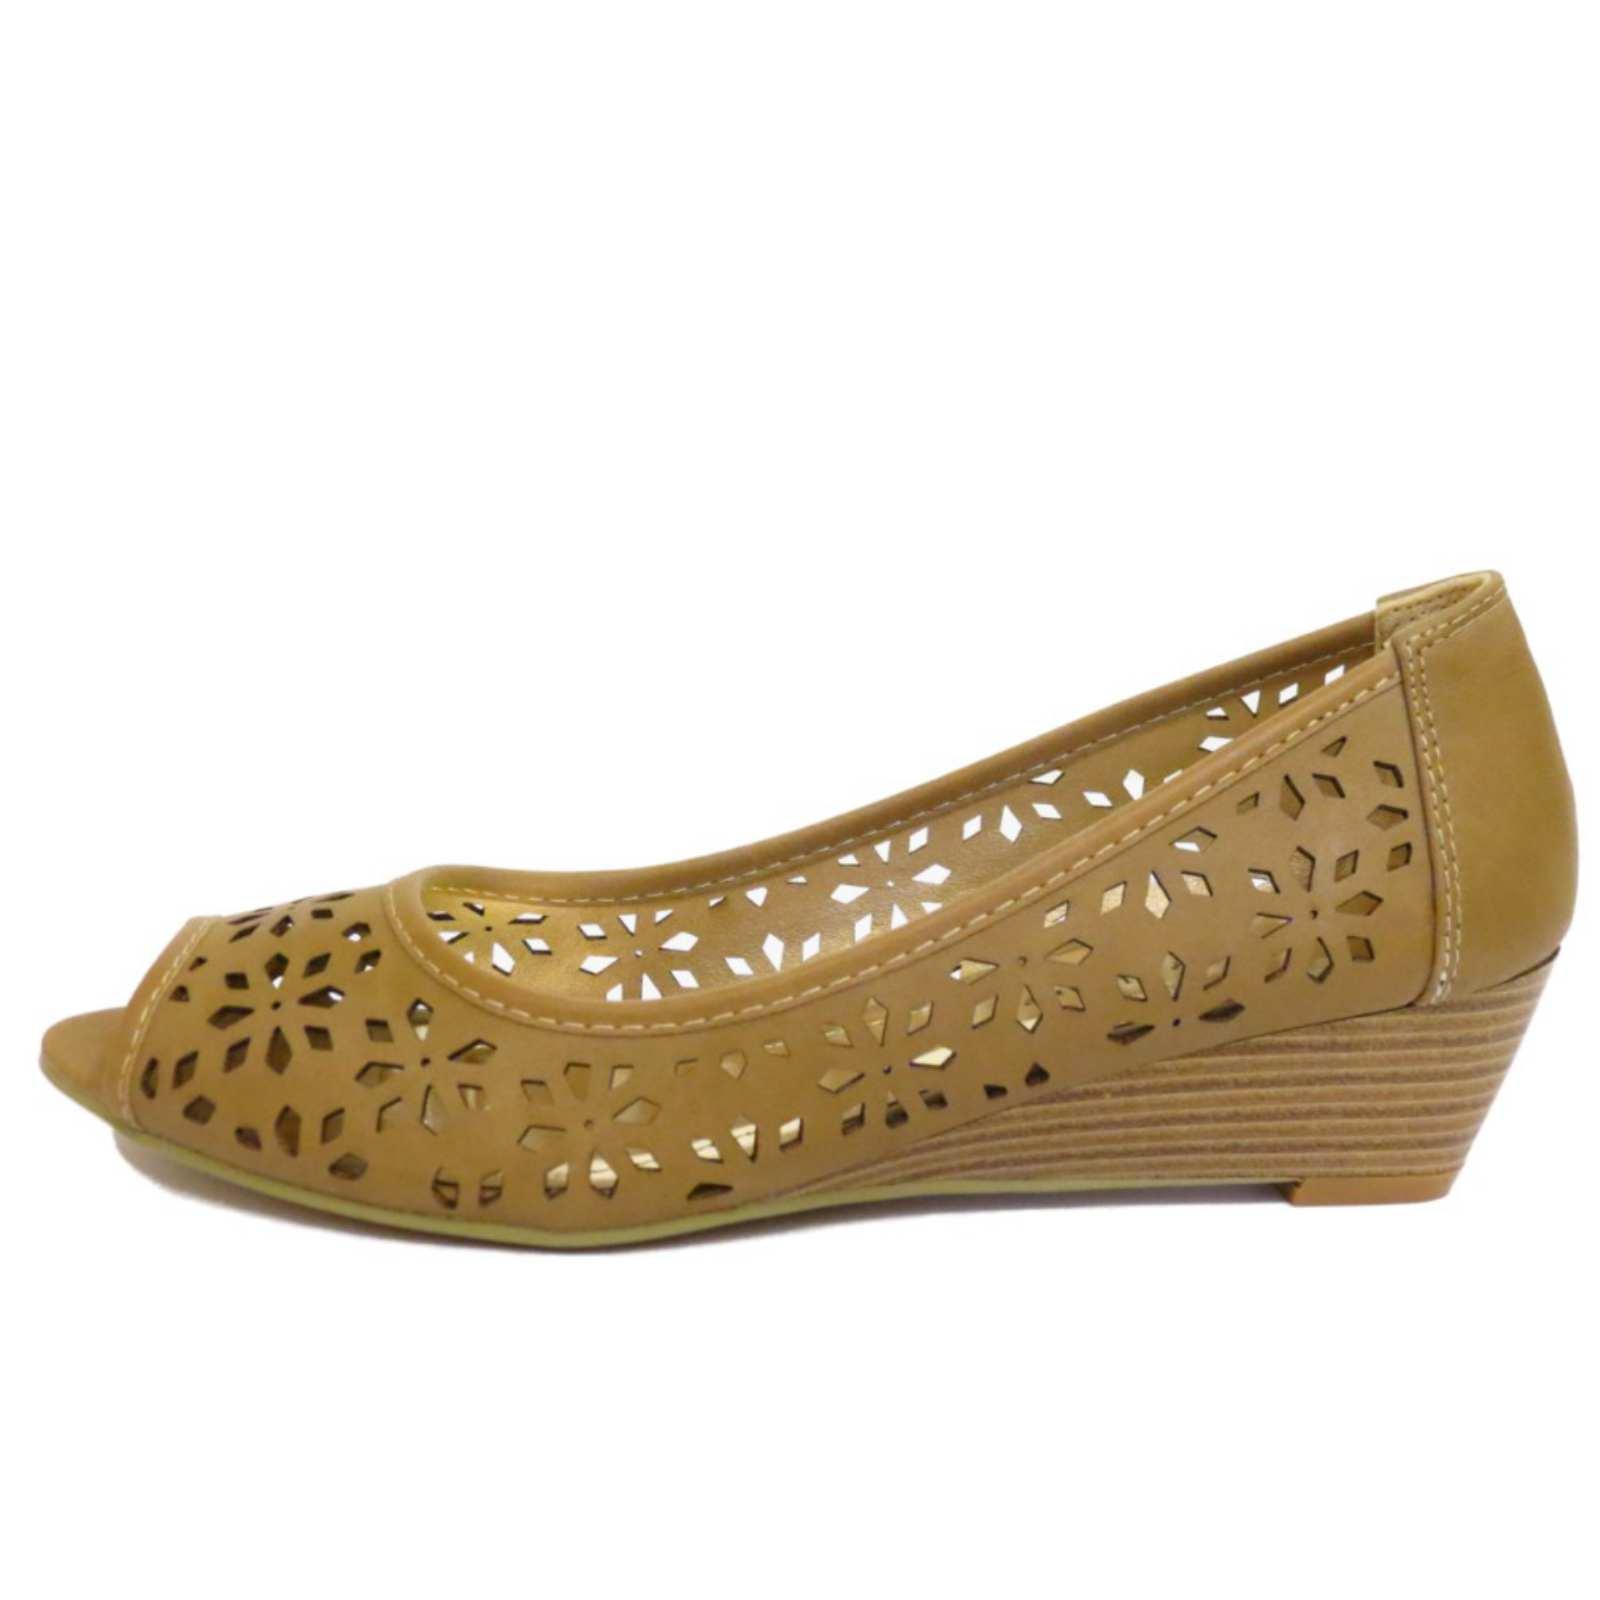 peep toe slip on wedge low kitten heel pumps